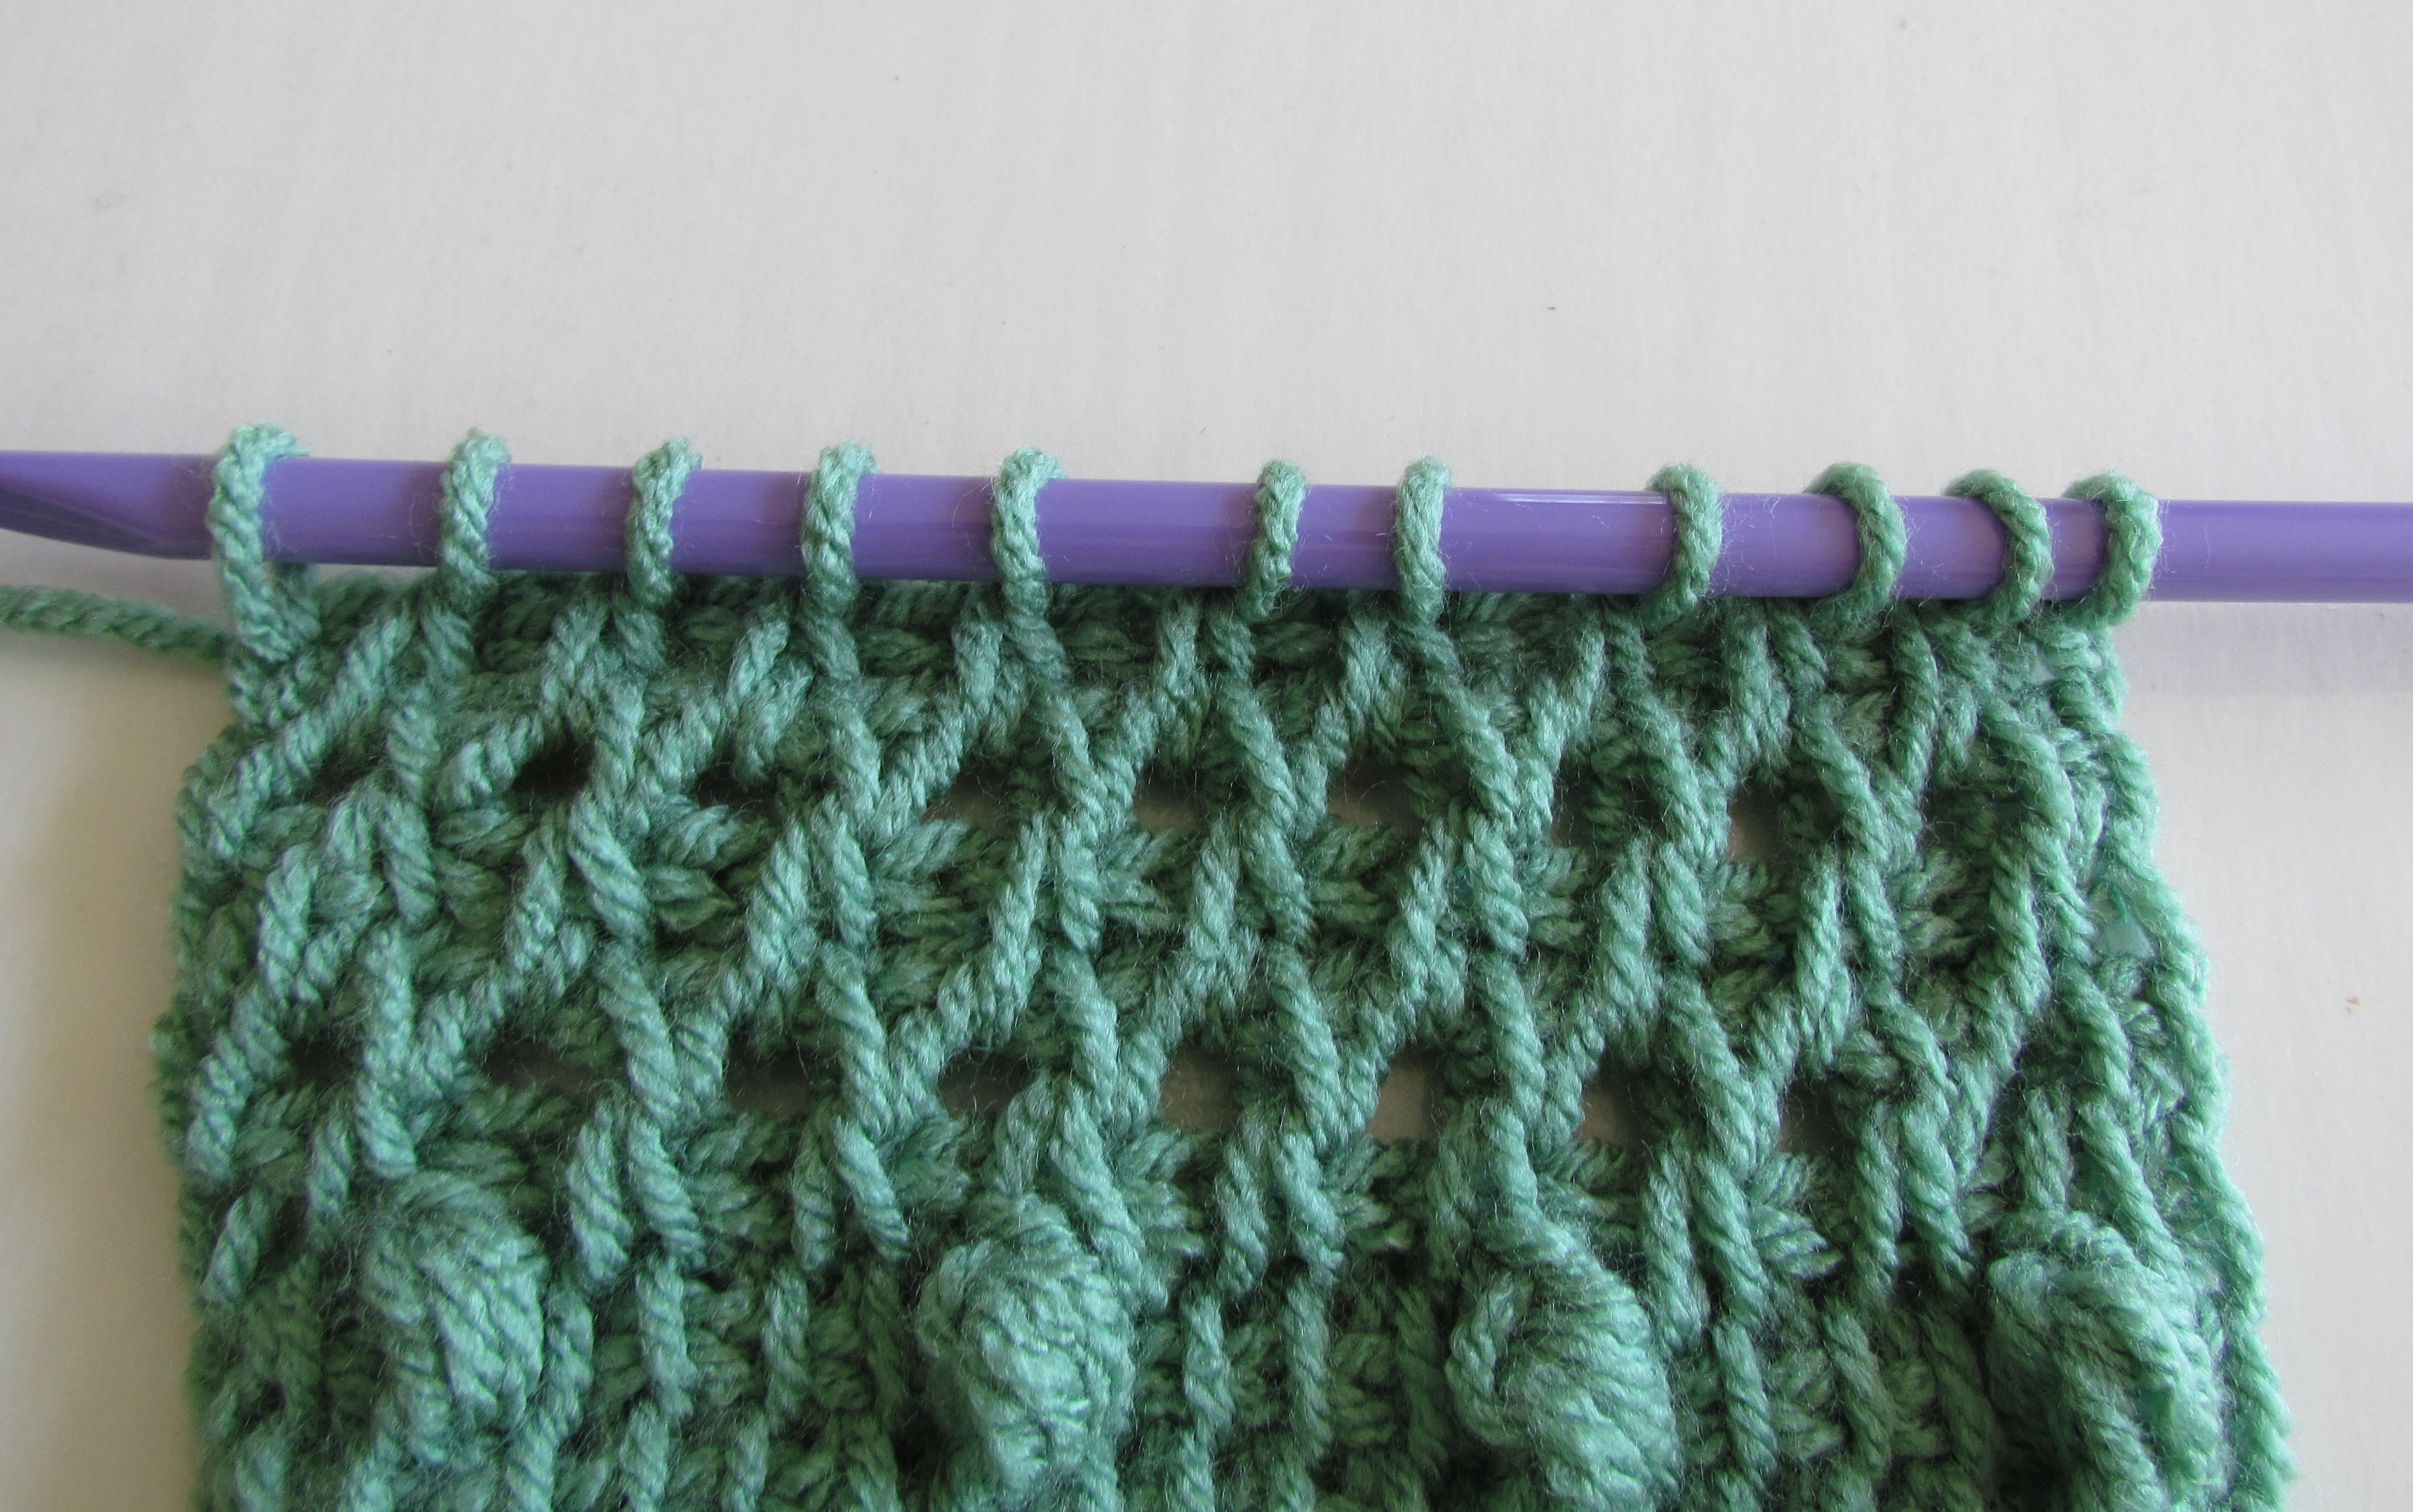 Crocheted Openwork Vest - Arts Crafts Michaels Stores